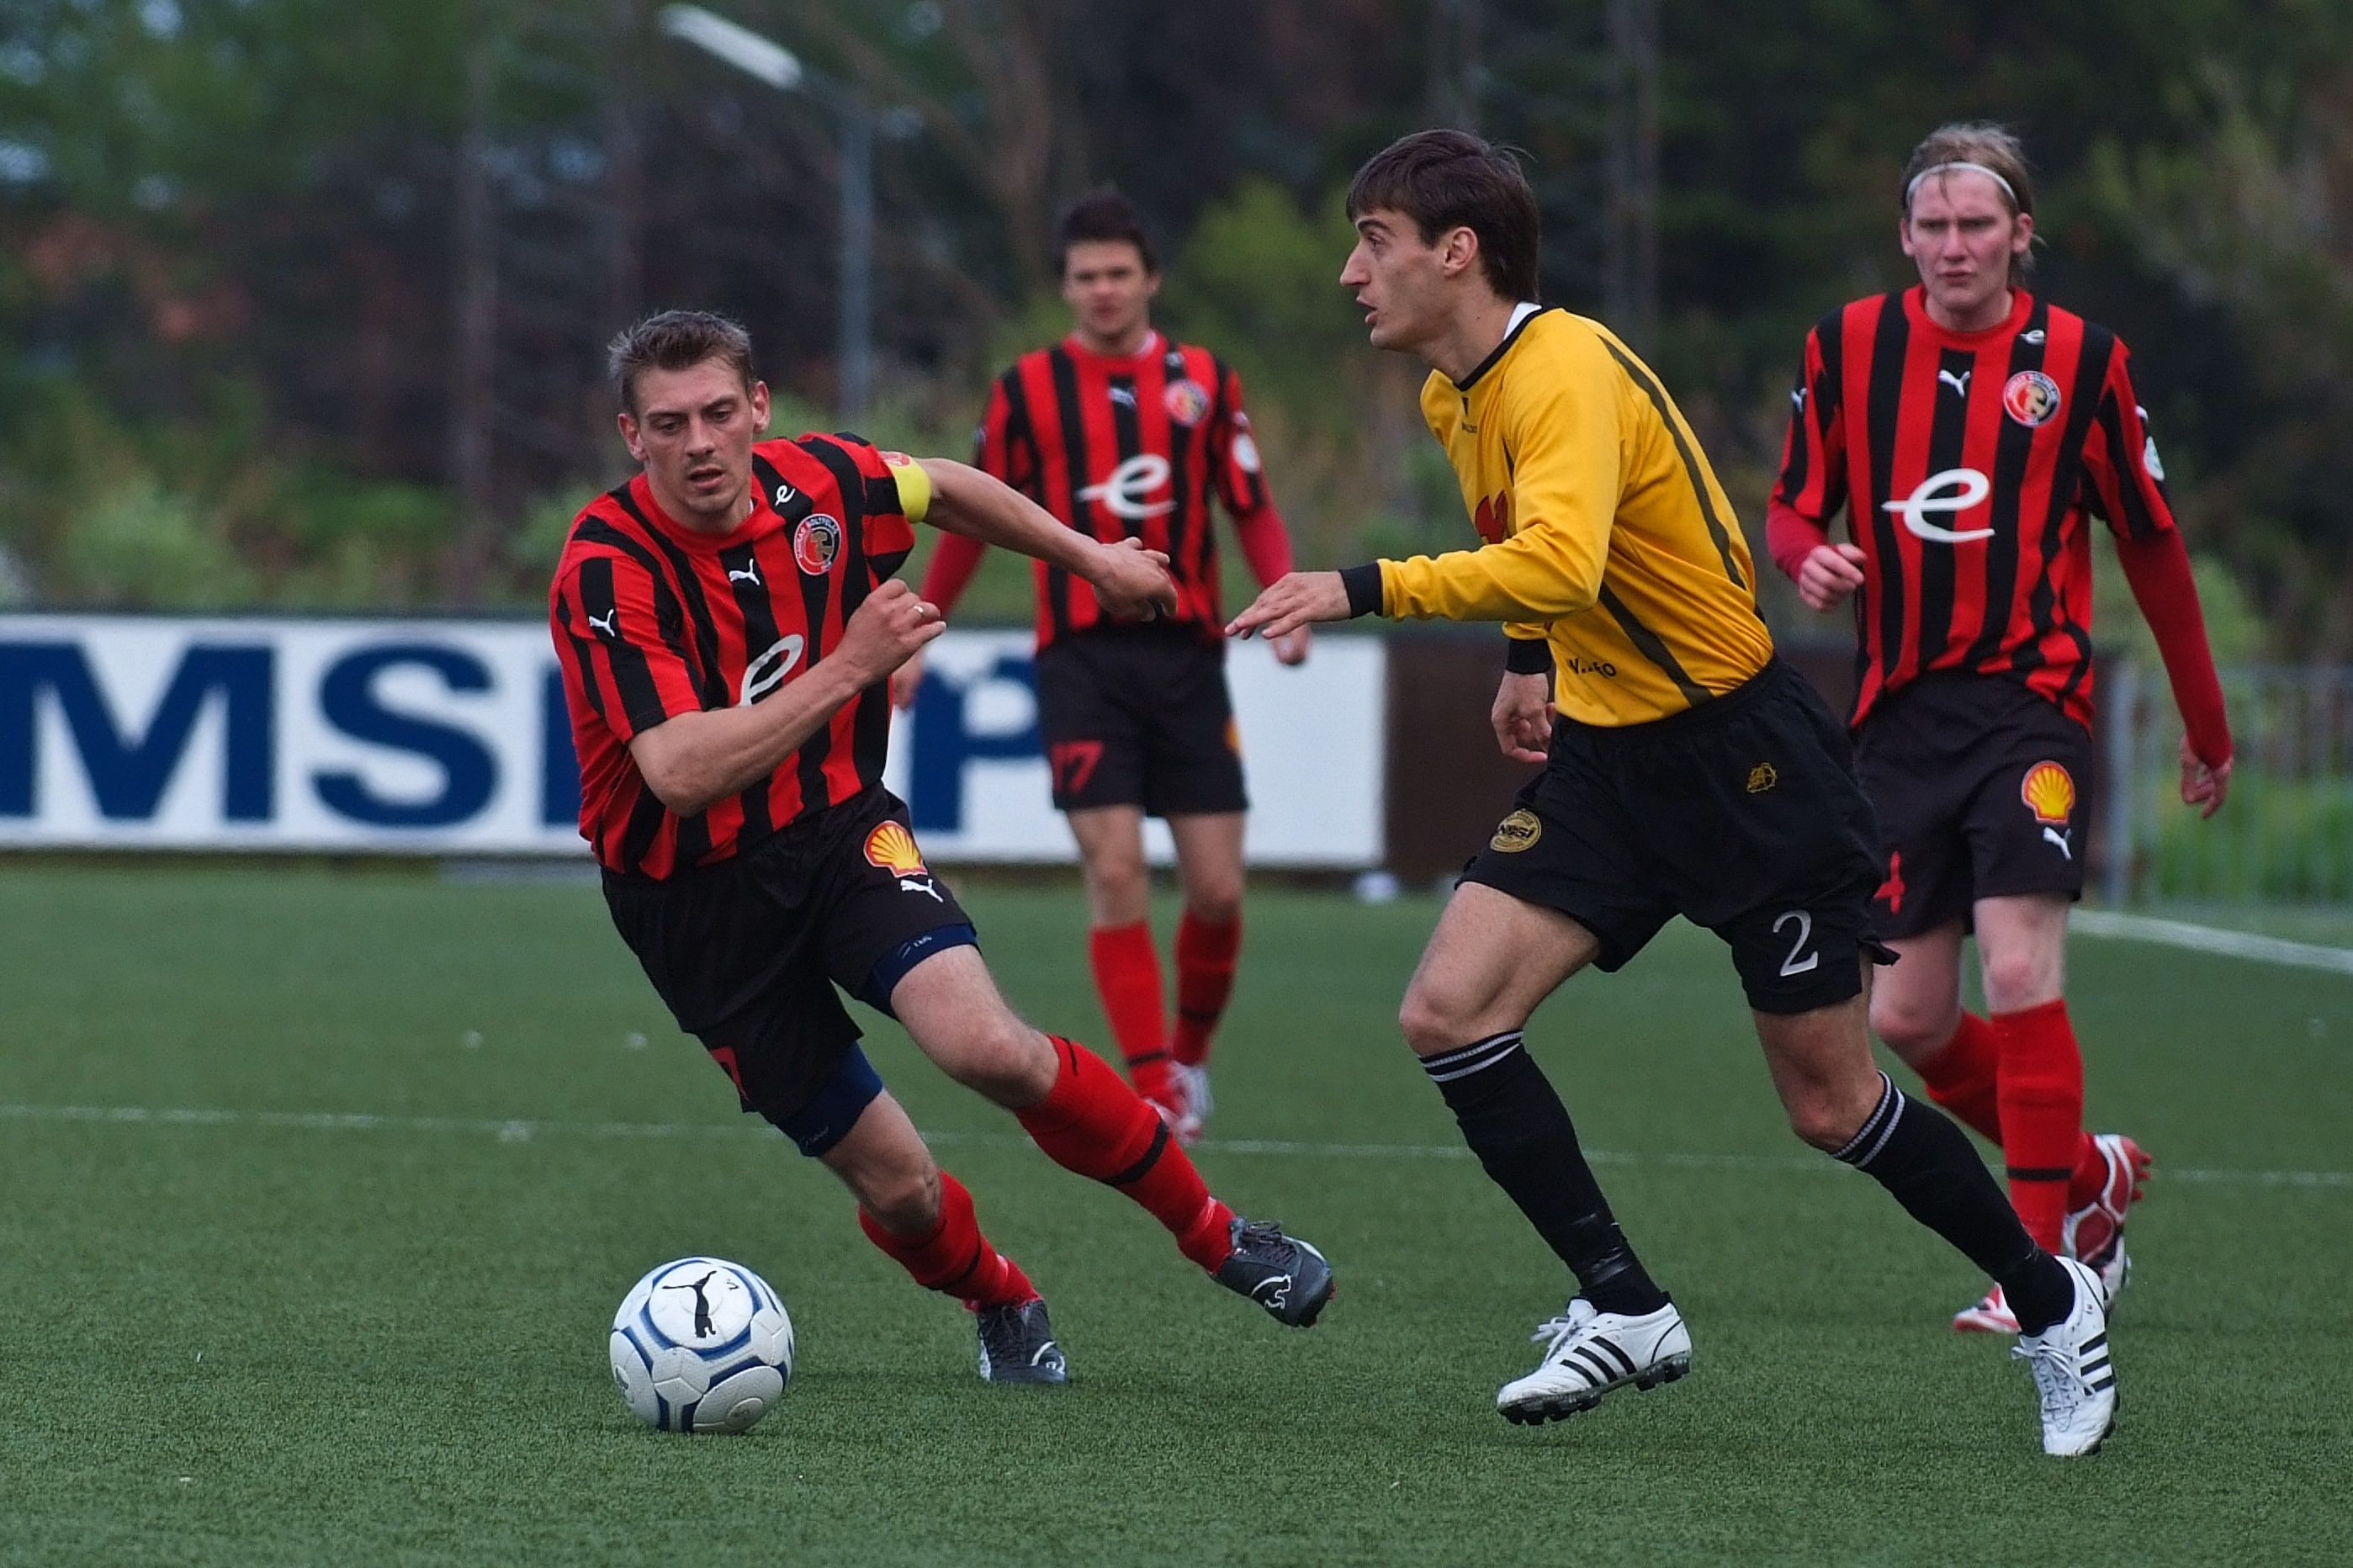 A local league football match